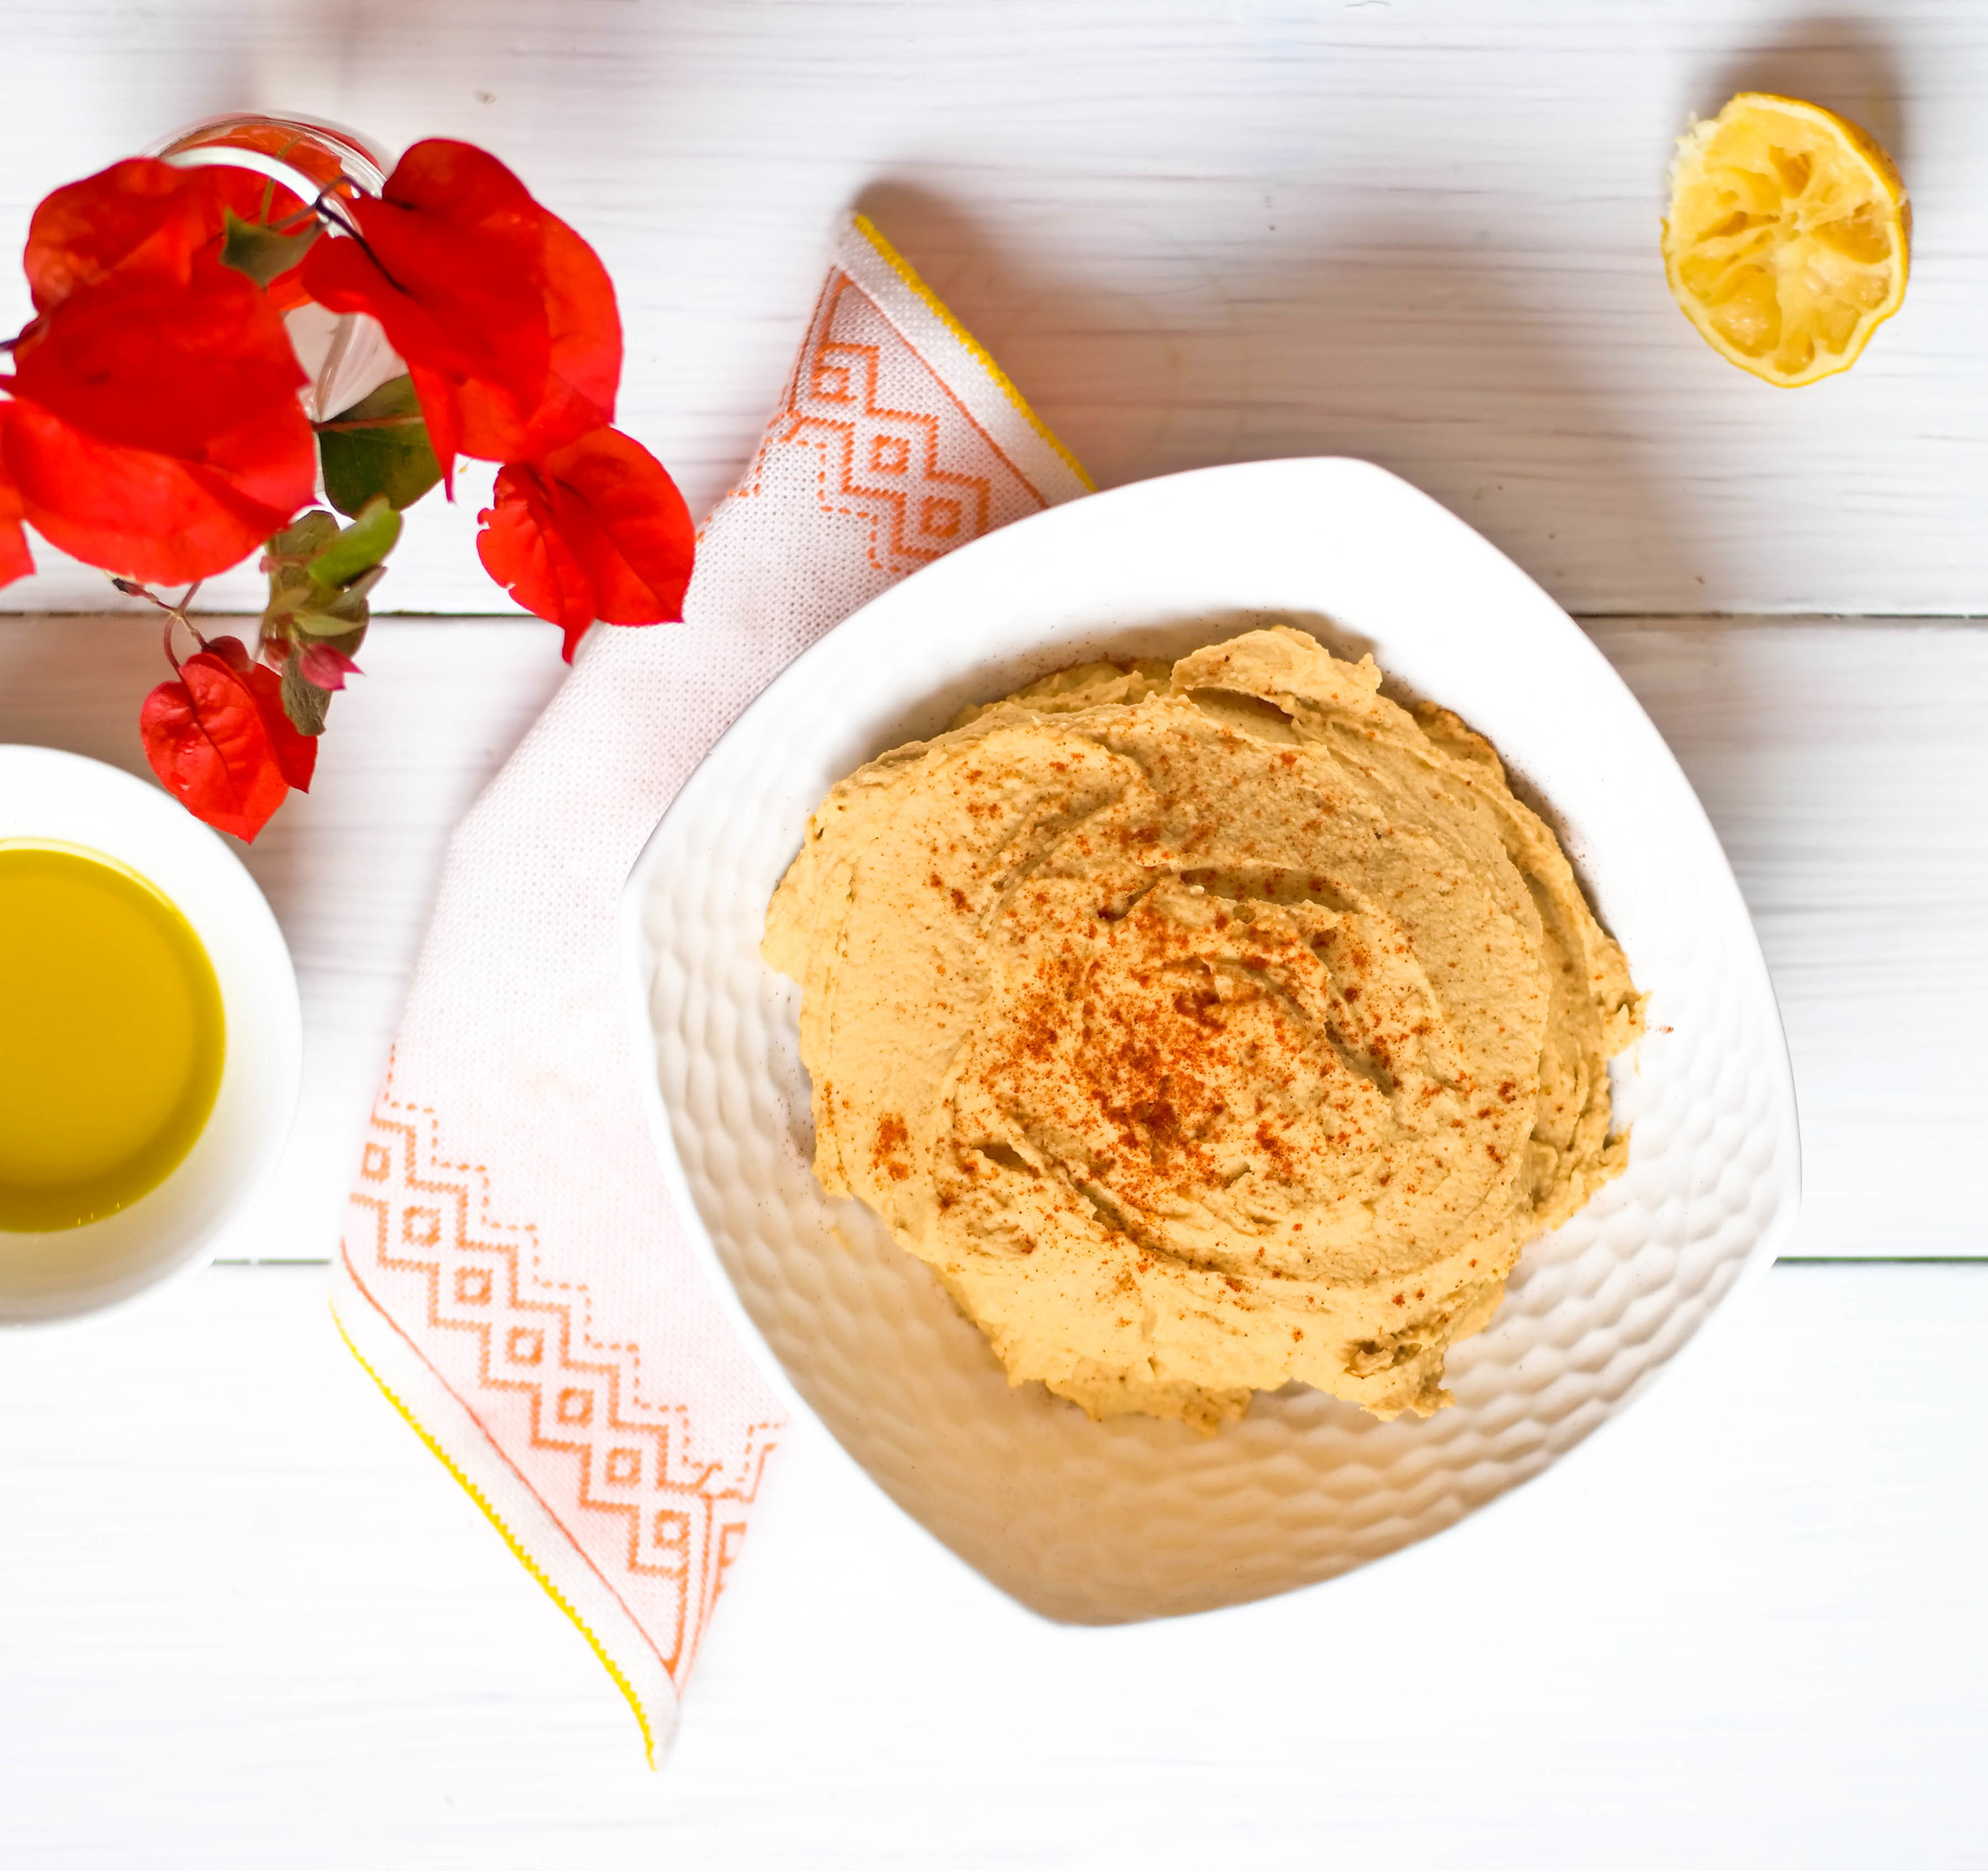 Delicious-Paprika-Hummus | www.8thandlake.com